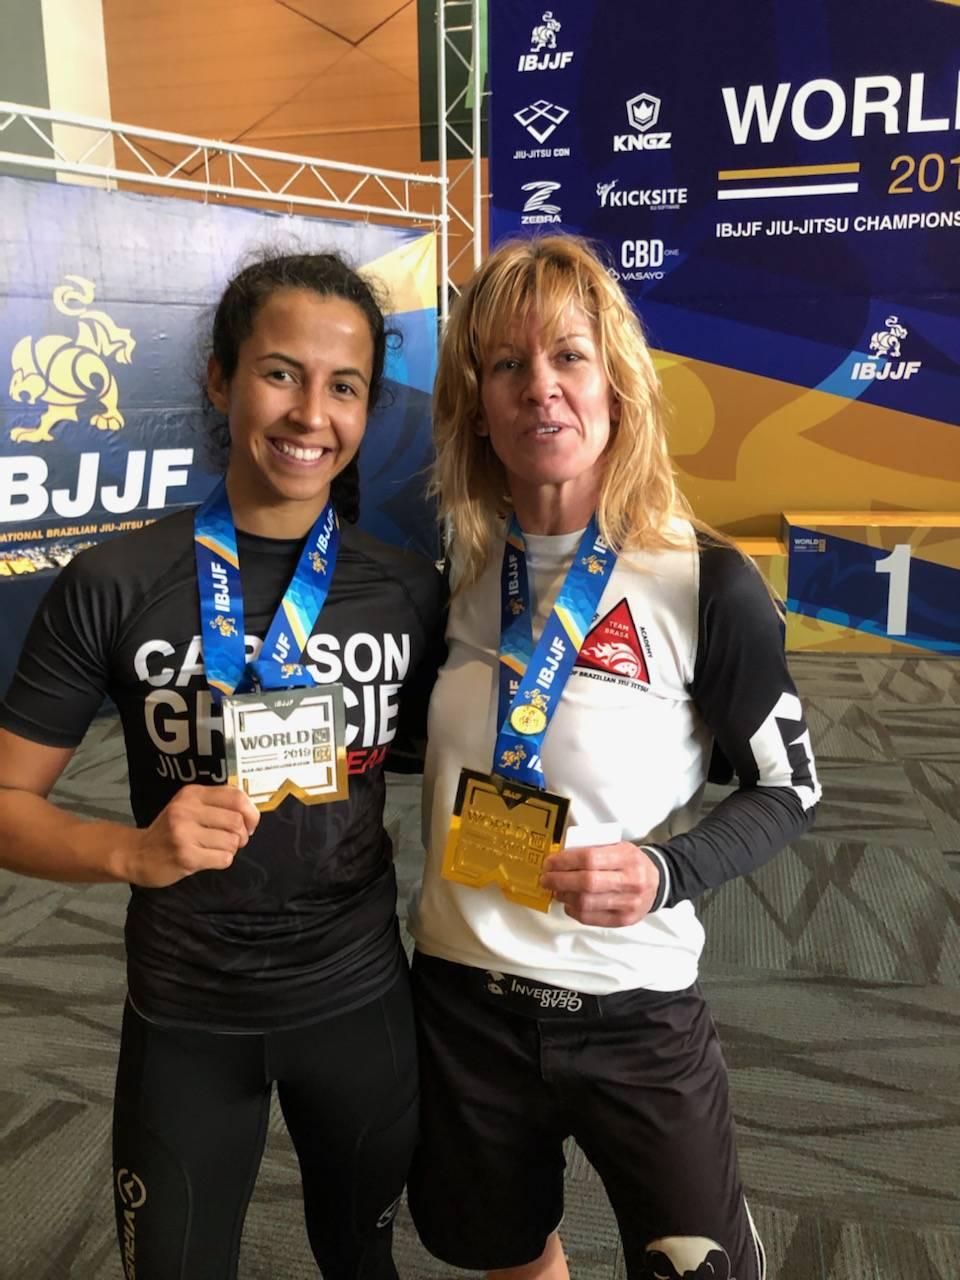 Claunch Academy of Brazilian Jiu-Jitsu - health  | Photo 3 of 4 | Address: 12233 Ranch Rd 620 N #109, Austin, TX 78750, USA | Phone: (512) 297-0529